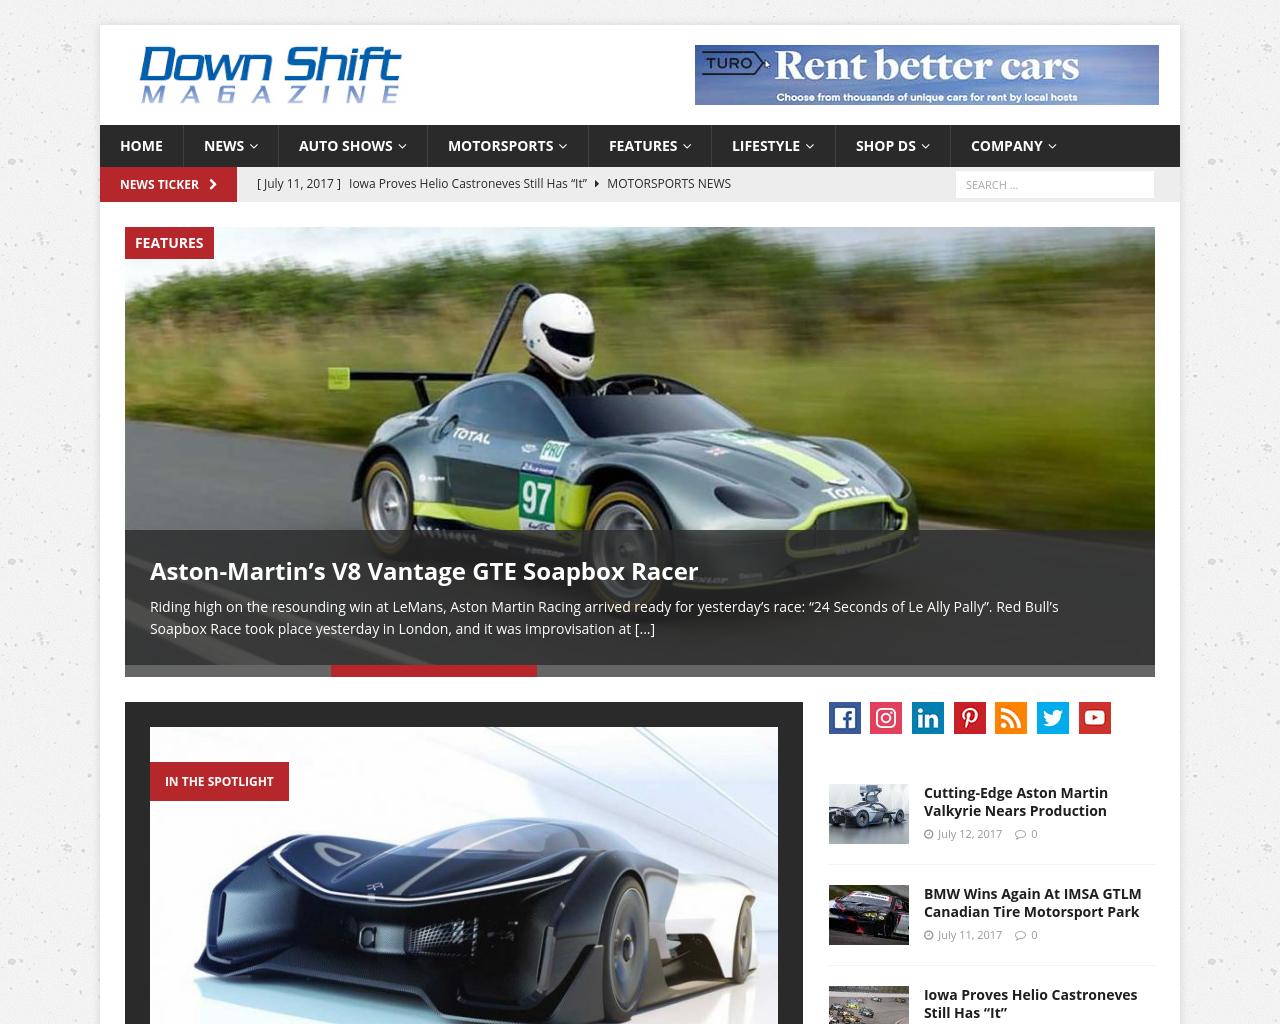 Downshiftmagazine.com-Advertising-Reviews-Pricing